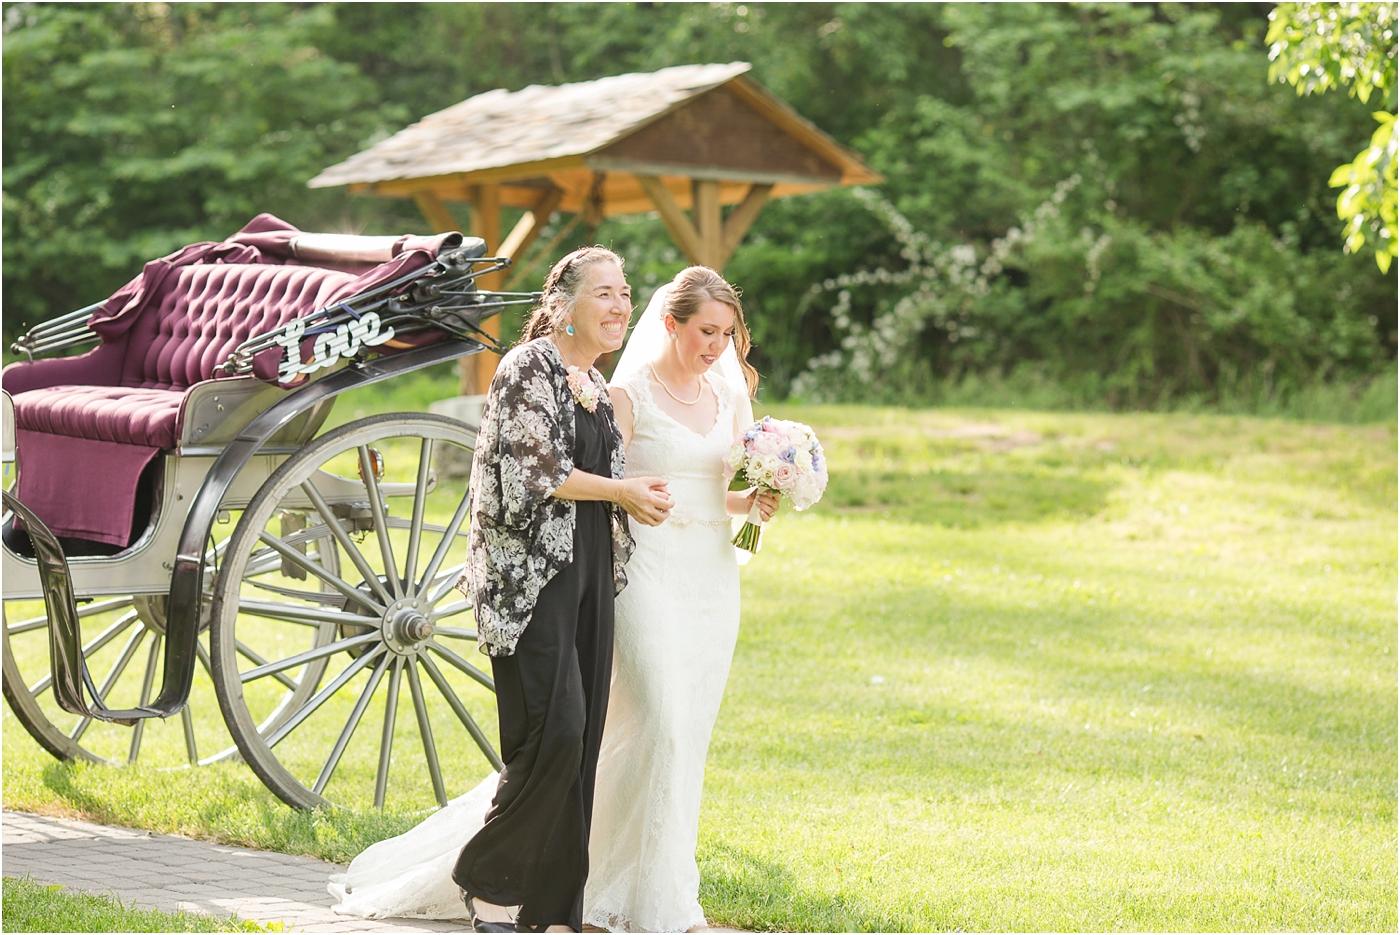 Gettysburg-lodges-wedding-photos-50.jpg